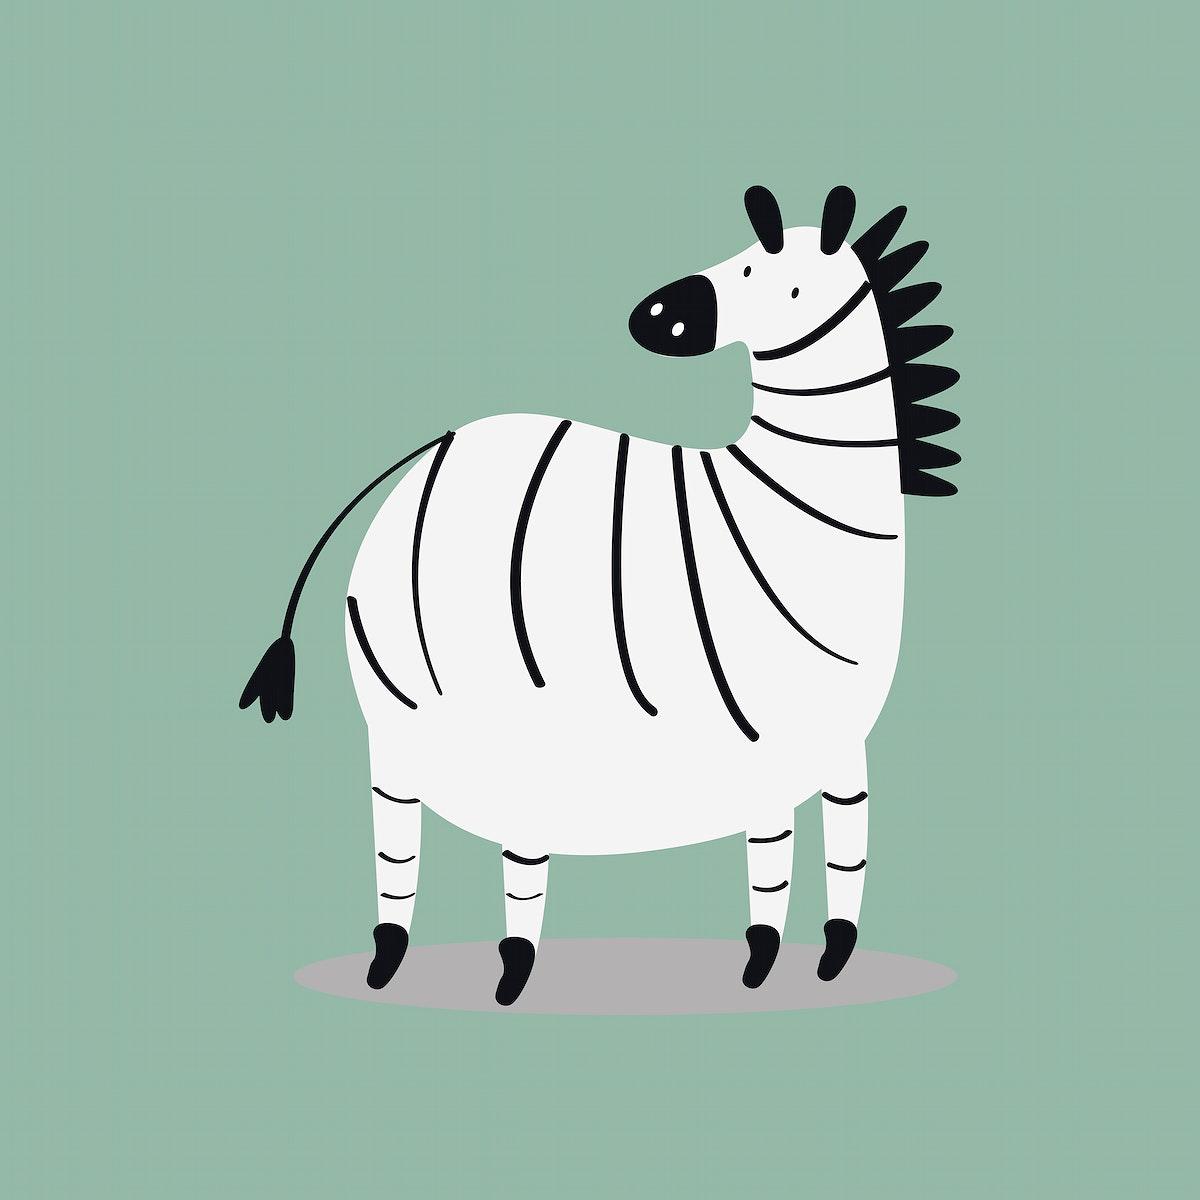 Zebra animal cute wildlife cartoon illustration for kids